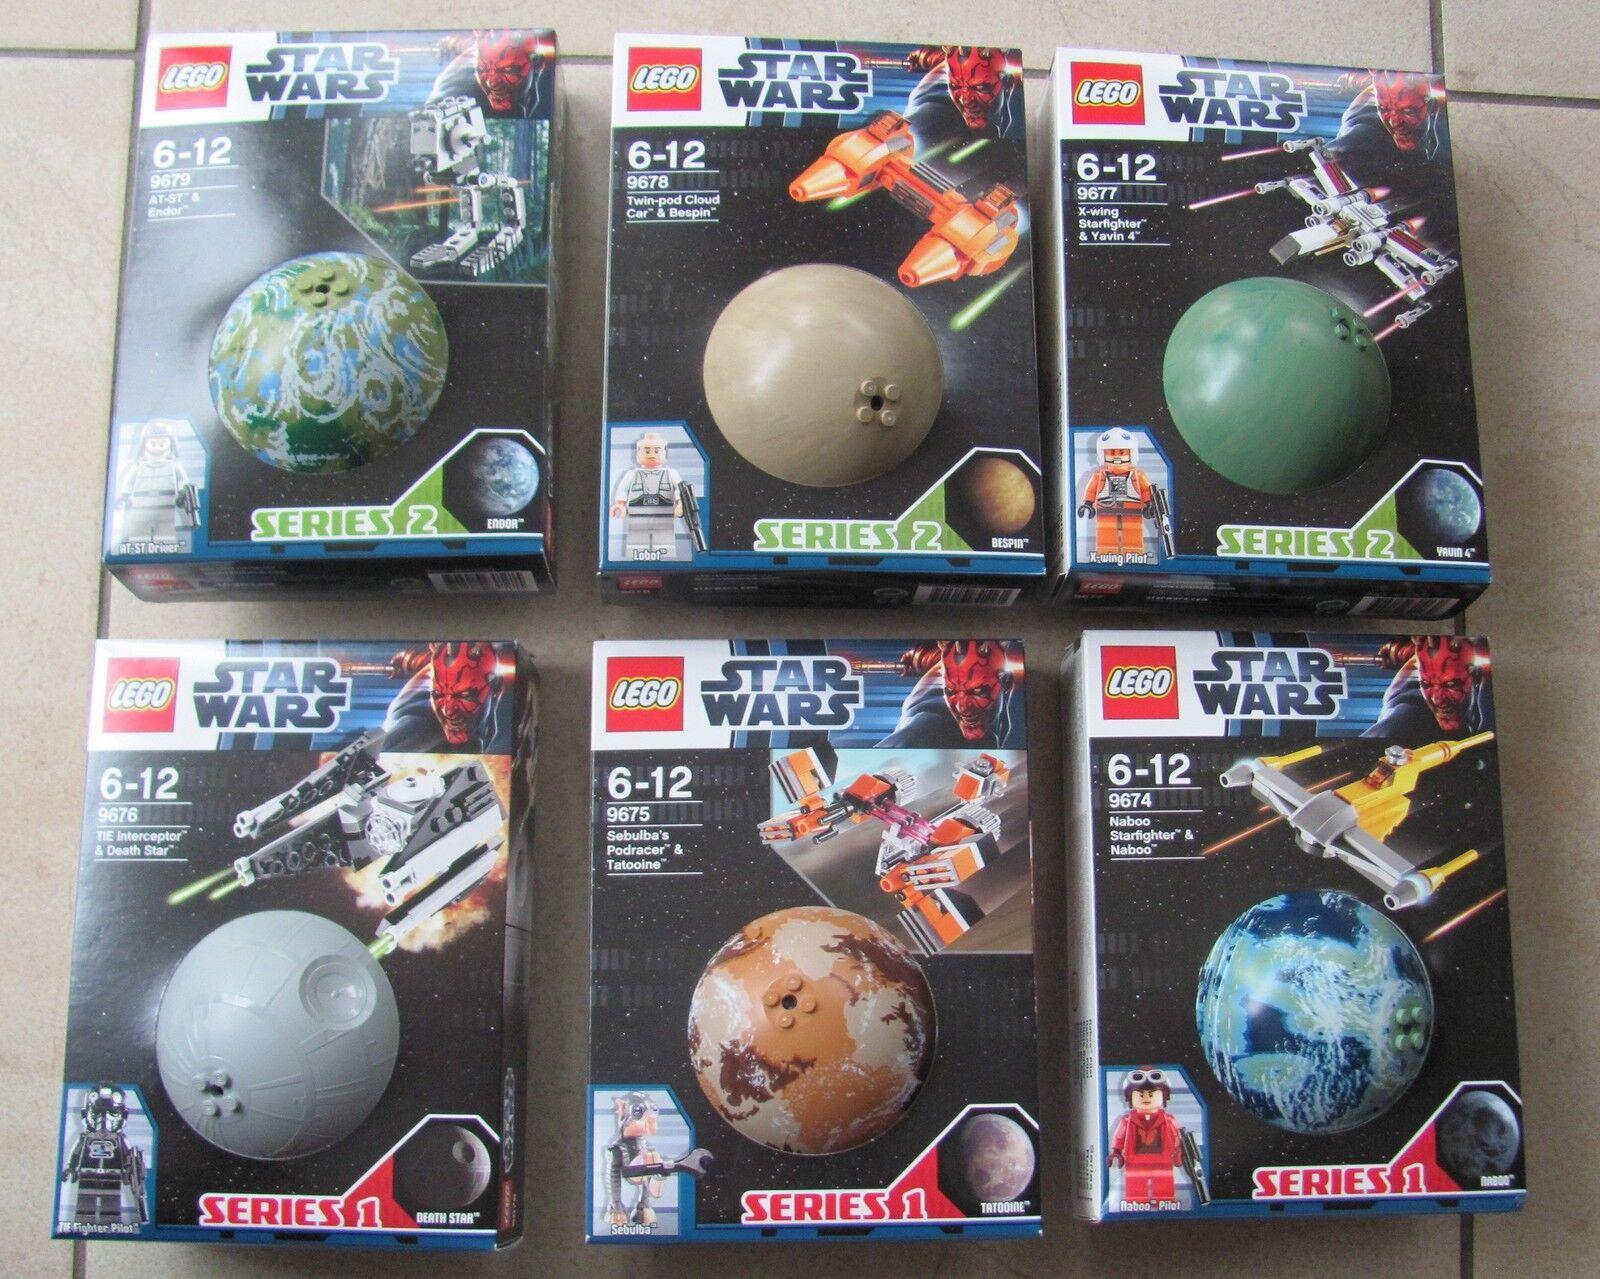 6 Lego Star Wars planeta 9674 9675 9676 9677 9678 9679 nuevo & OVP rareza rare